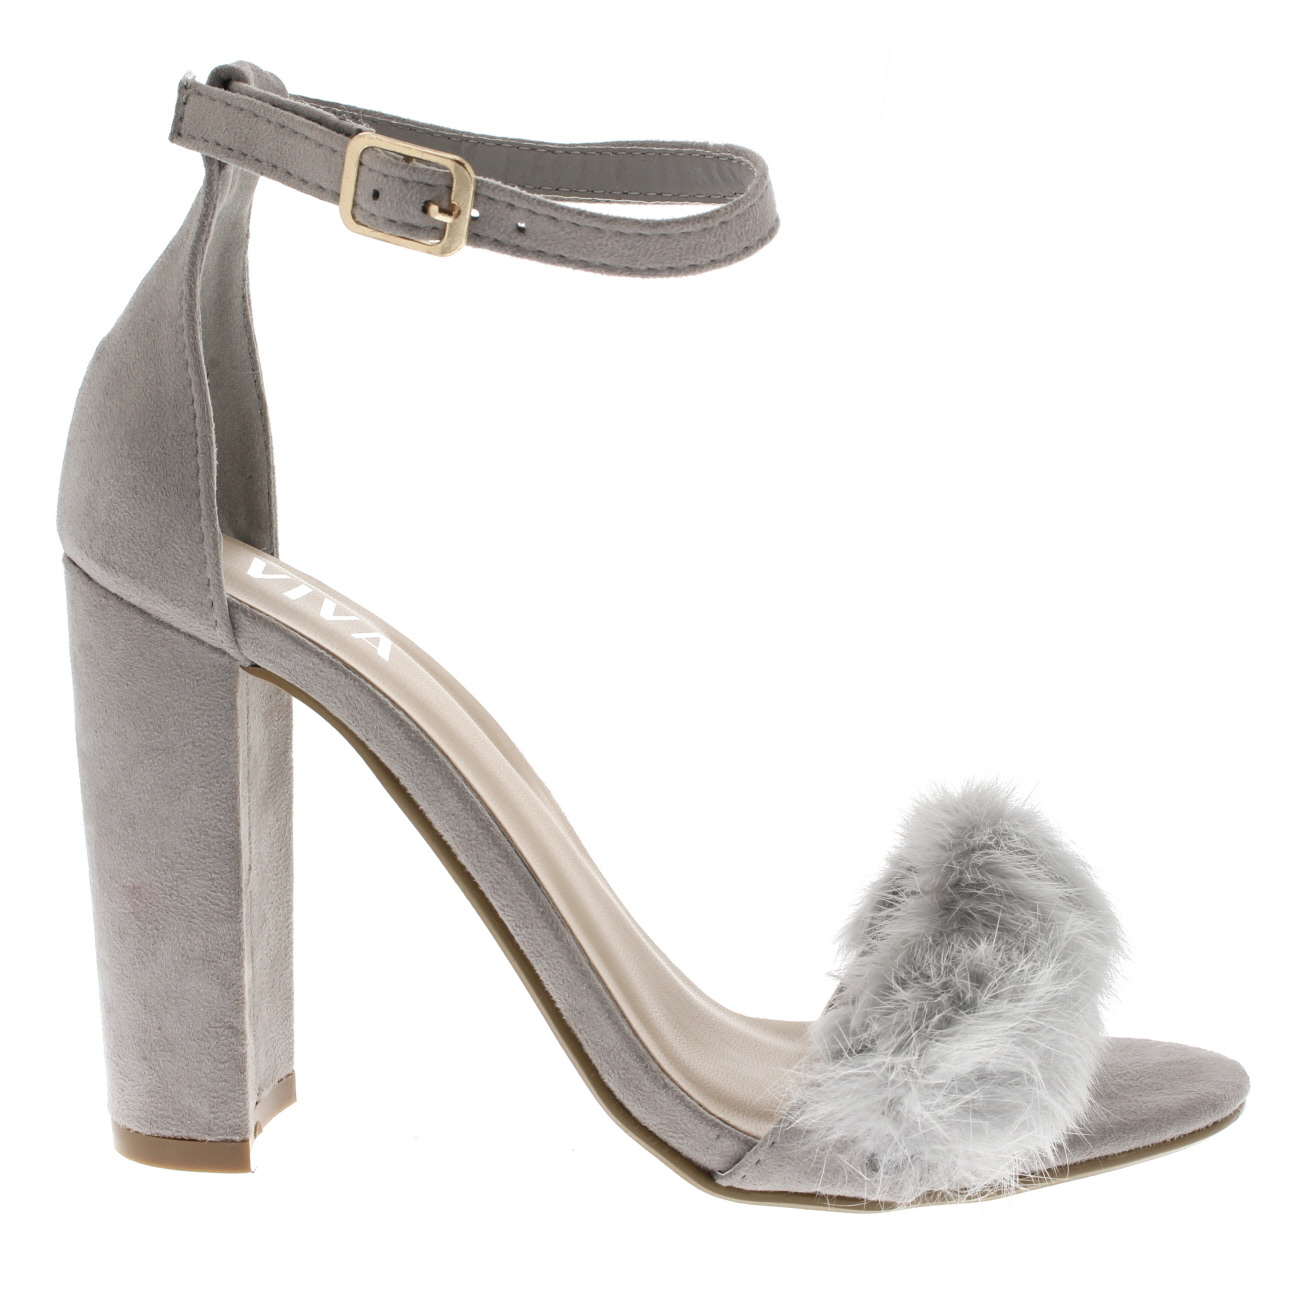 5deaa5f364b Ladies Evening Block Heel Fashion Cut Out Party High Heels Fluffy Pumps